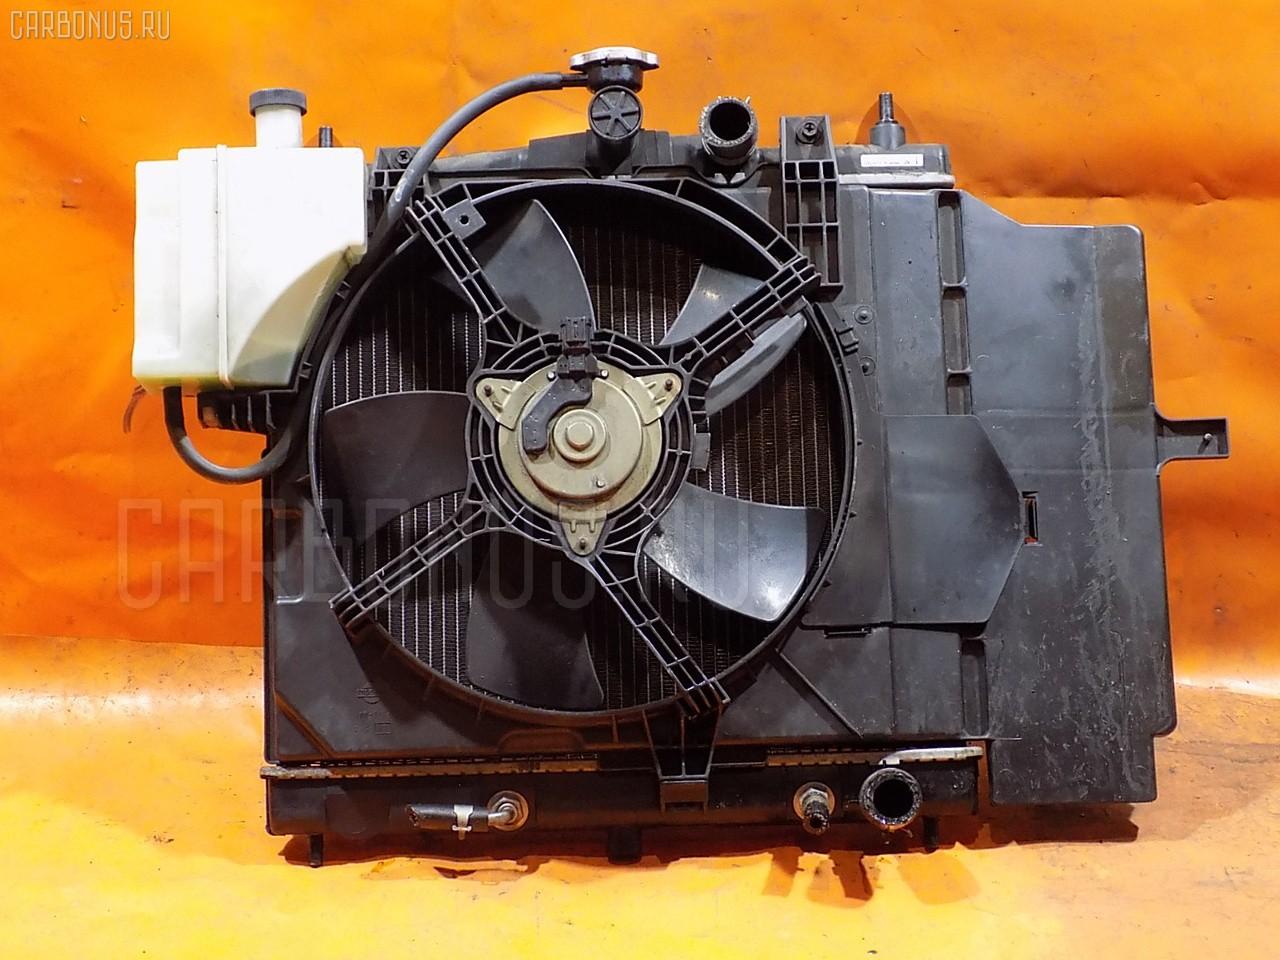 Радиатор ДВС NISSAN MARCH BK12 CR14DE. Фото 1